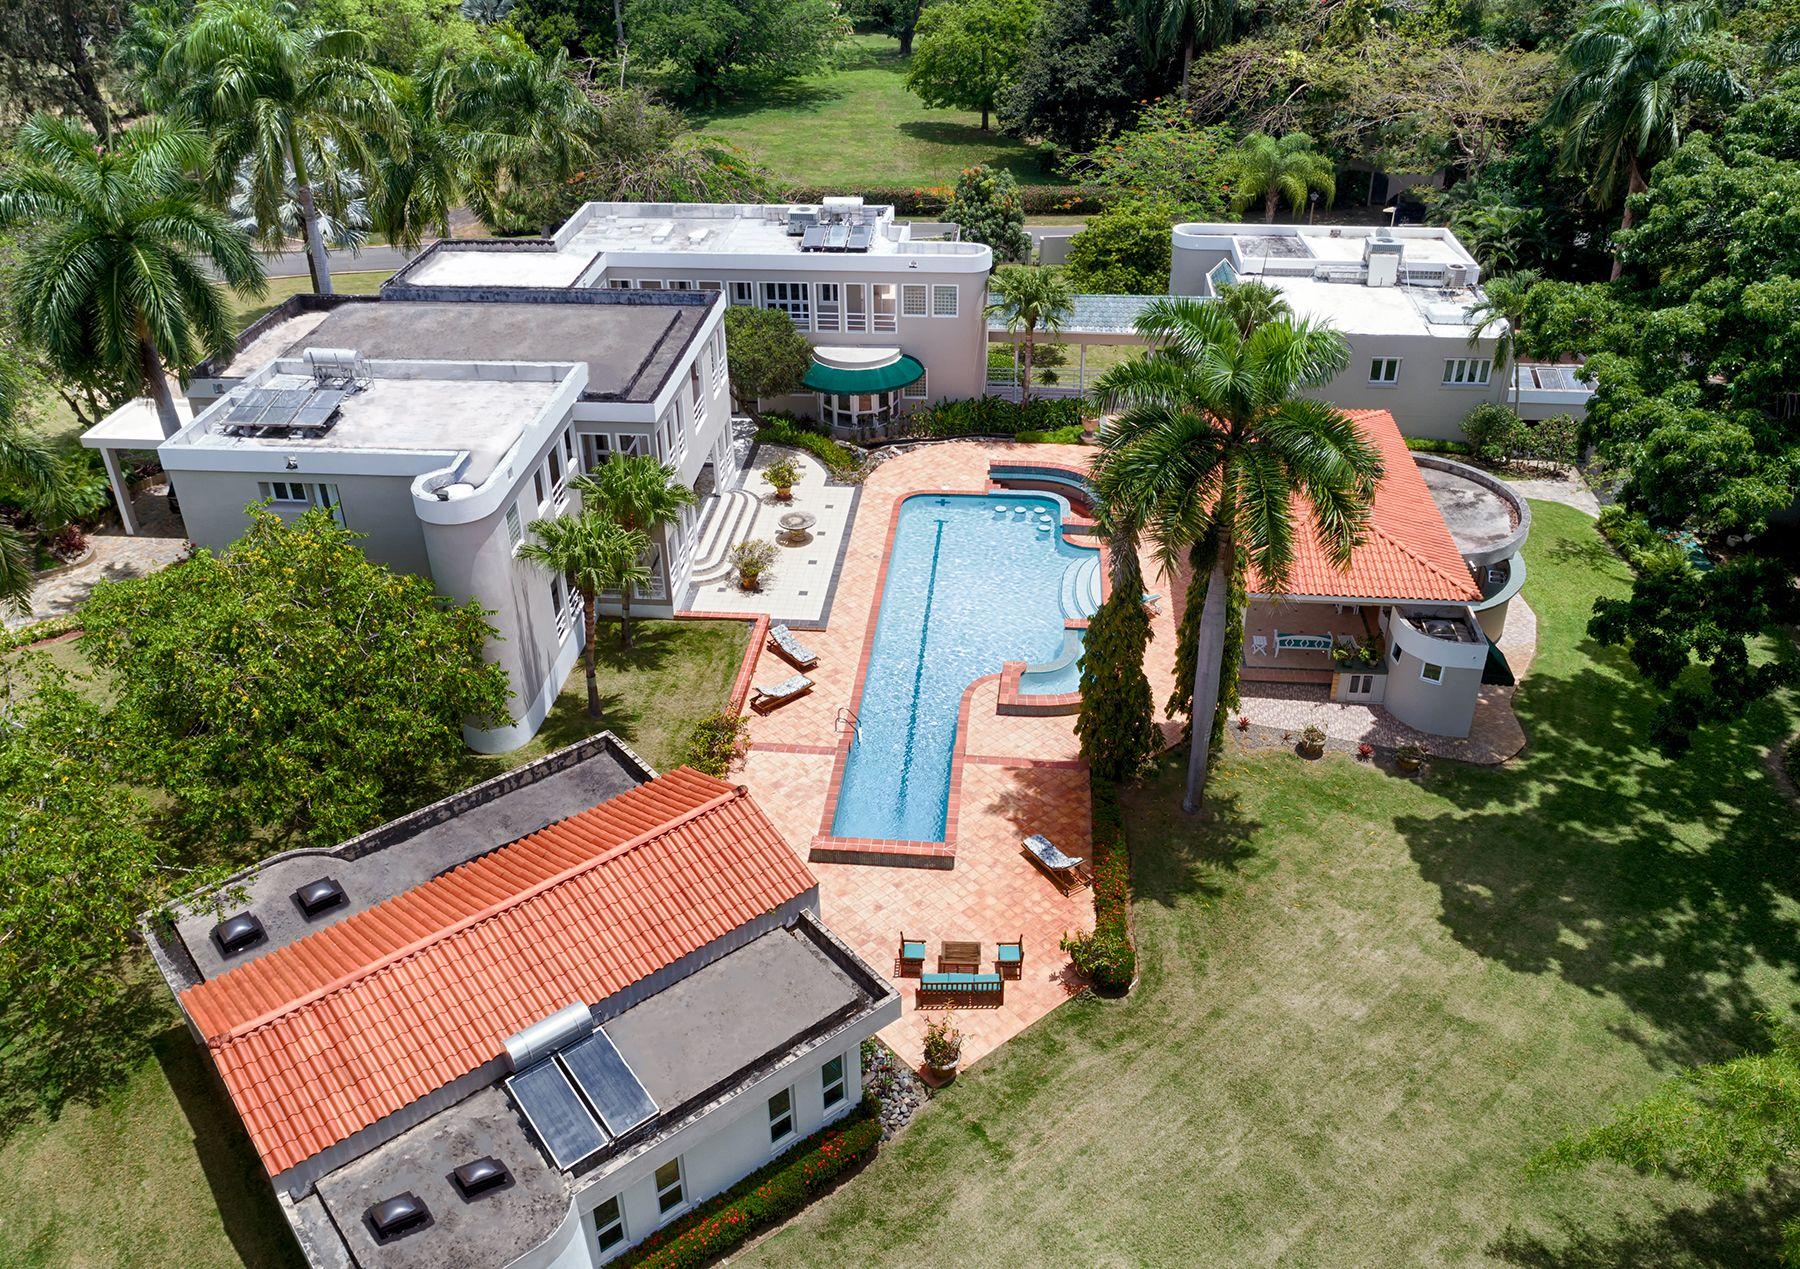 New Exclusive Listing A 14 Room Sprawling Estate In Dorado Beach Estates Propid 57xx34 Prsir Resort Lifestyle Ca Luxury Real Estate Pool Patio Estates